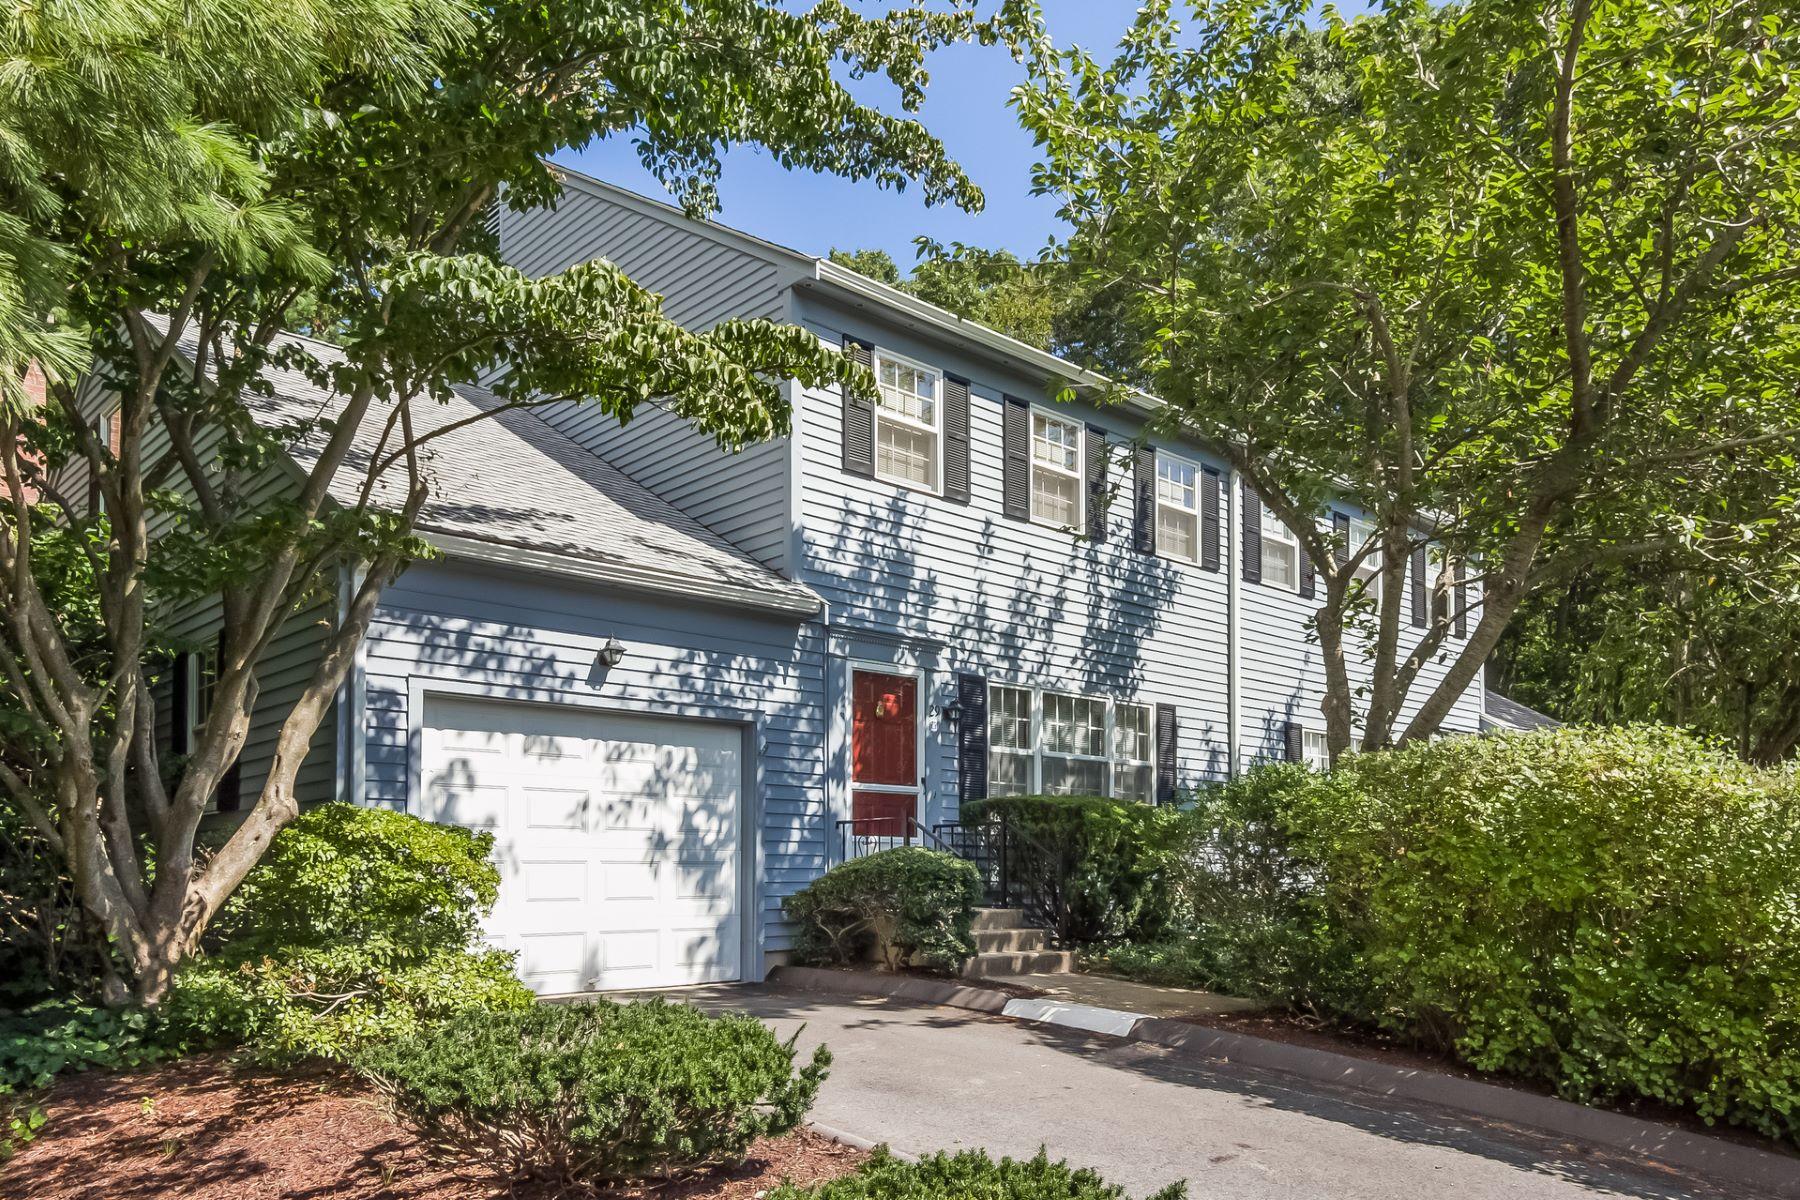 شقة بعمارة للـ Sale في 29 Hampshire Road 29 Hampshire Road 29, Madison, Connecticut, 06443 United States